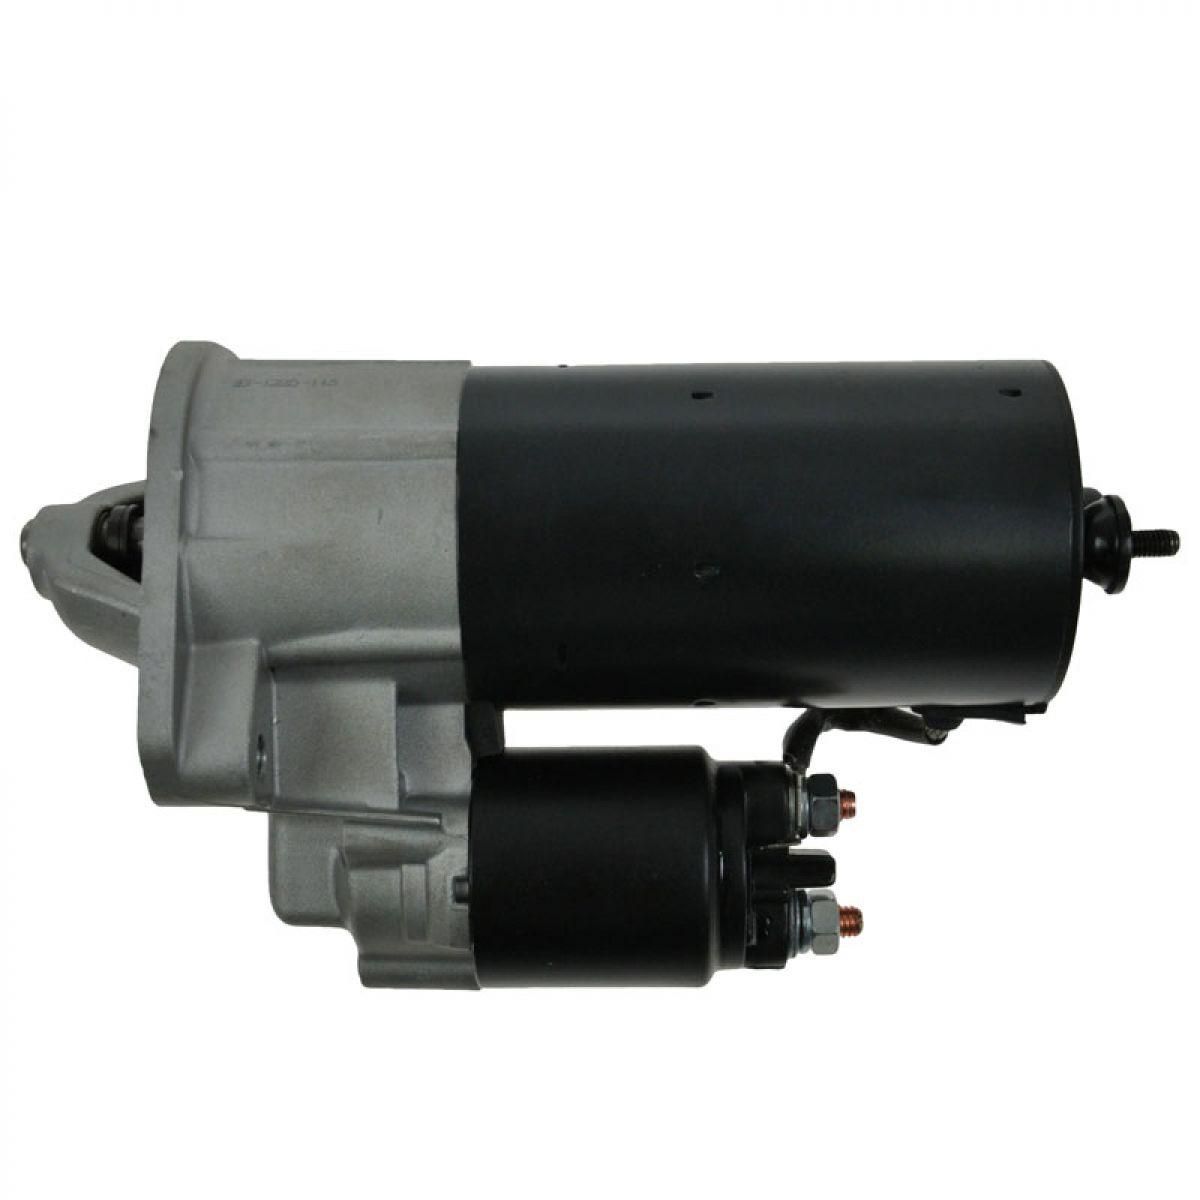 Starter Motor 8111199 9168267 for Volvo 99-05 S80 03-06 XC90 L6 2.9L